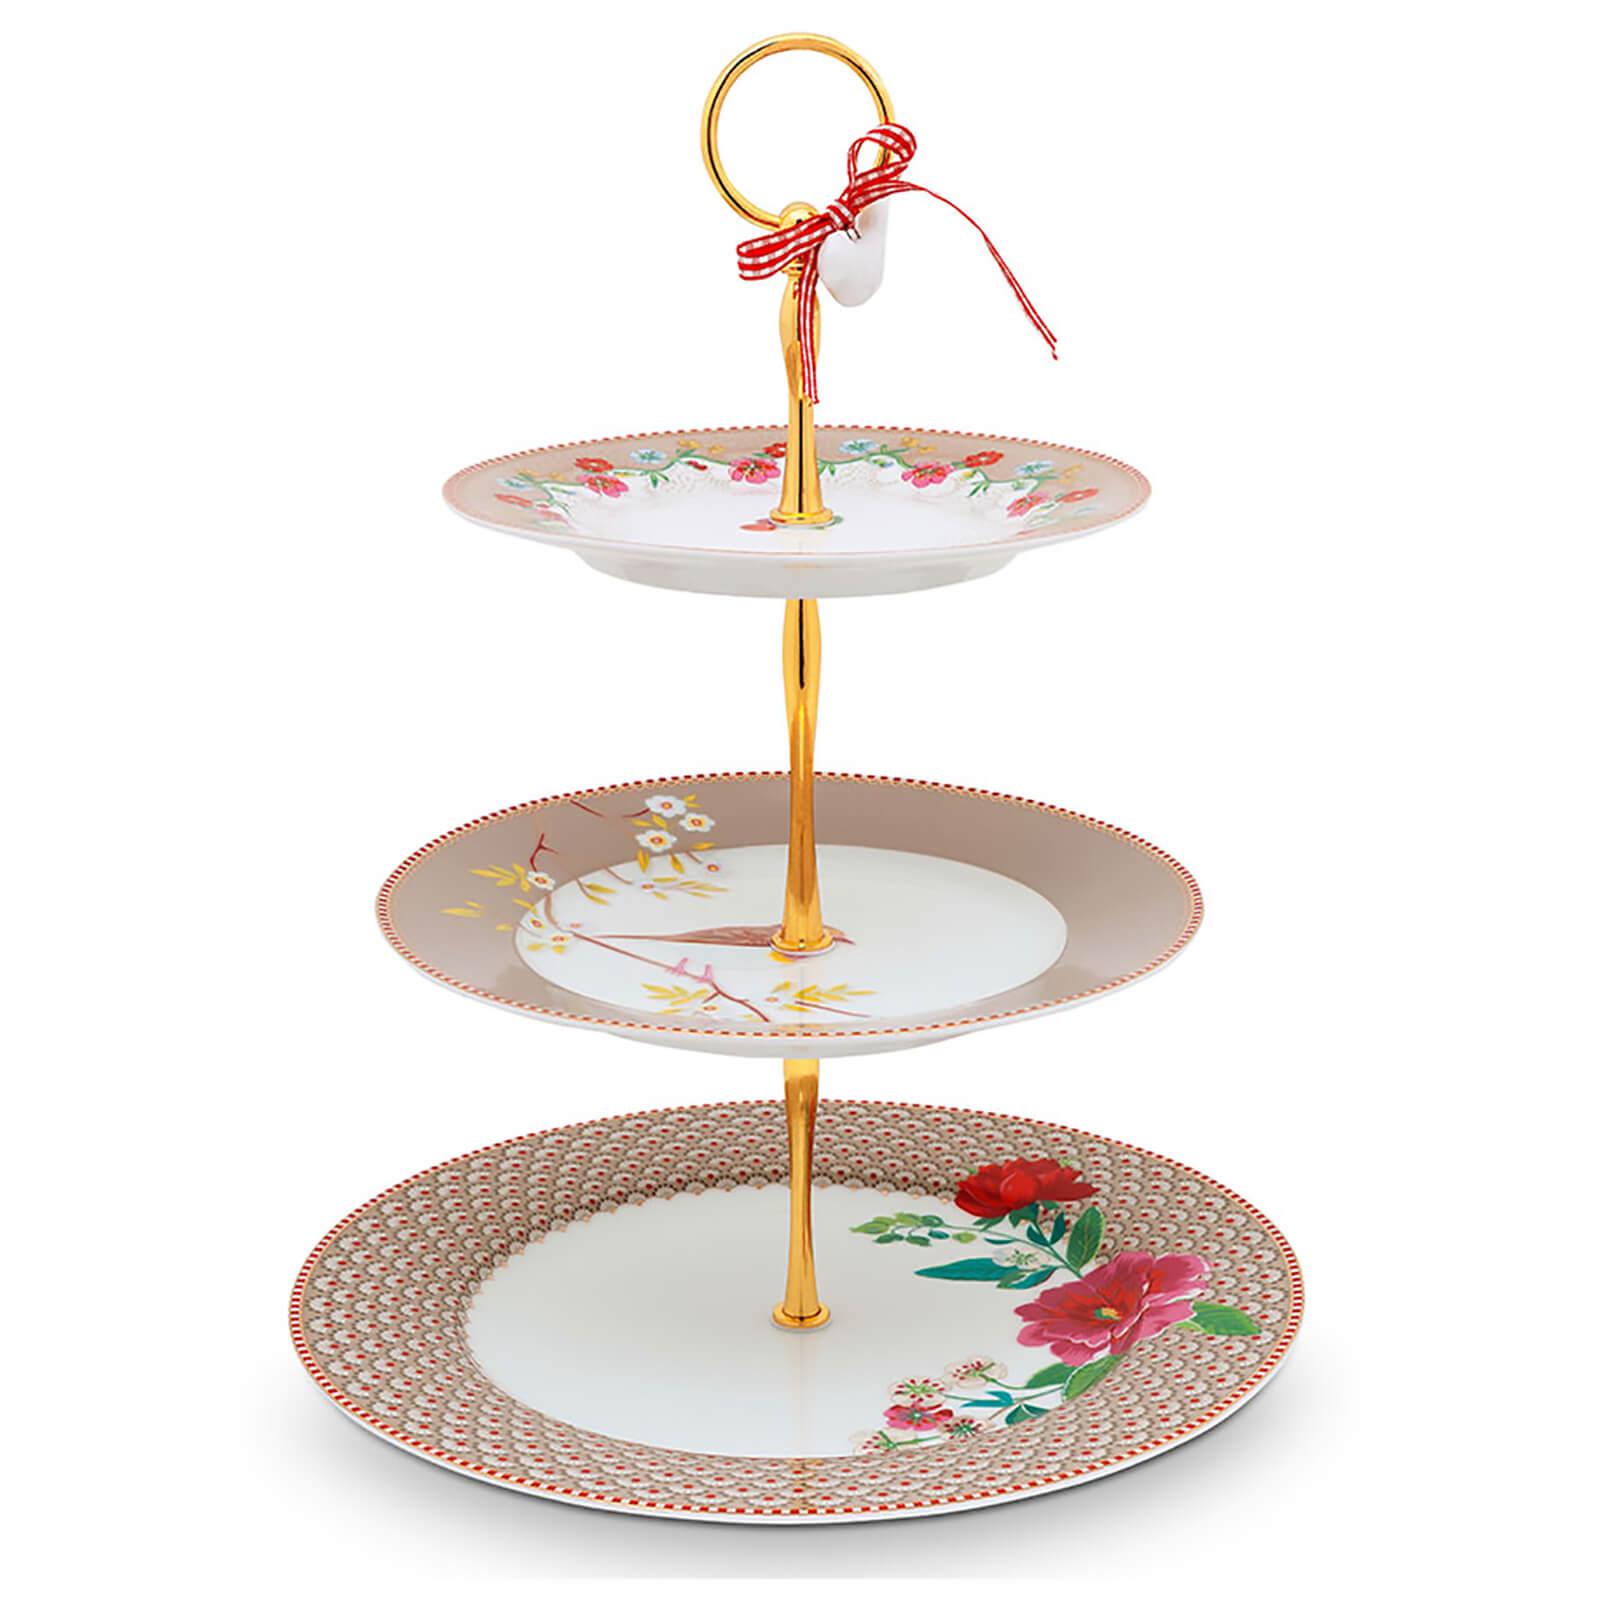 Pip Studio 3 Tier Floral Cake Stand - Khaki